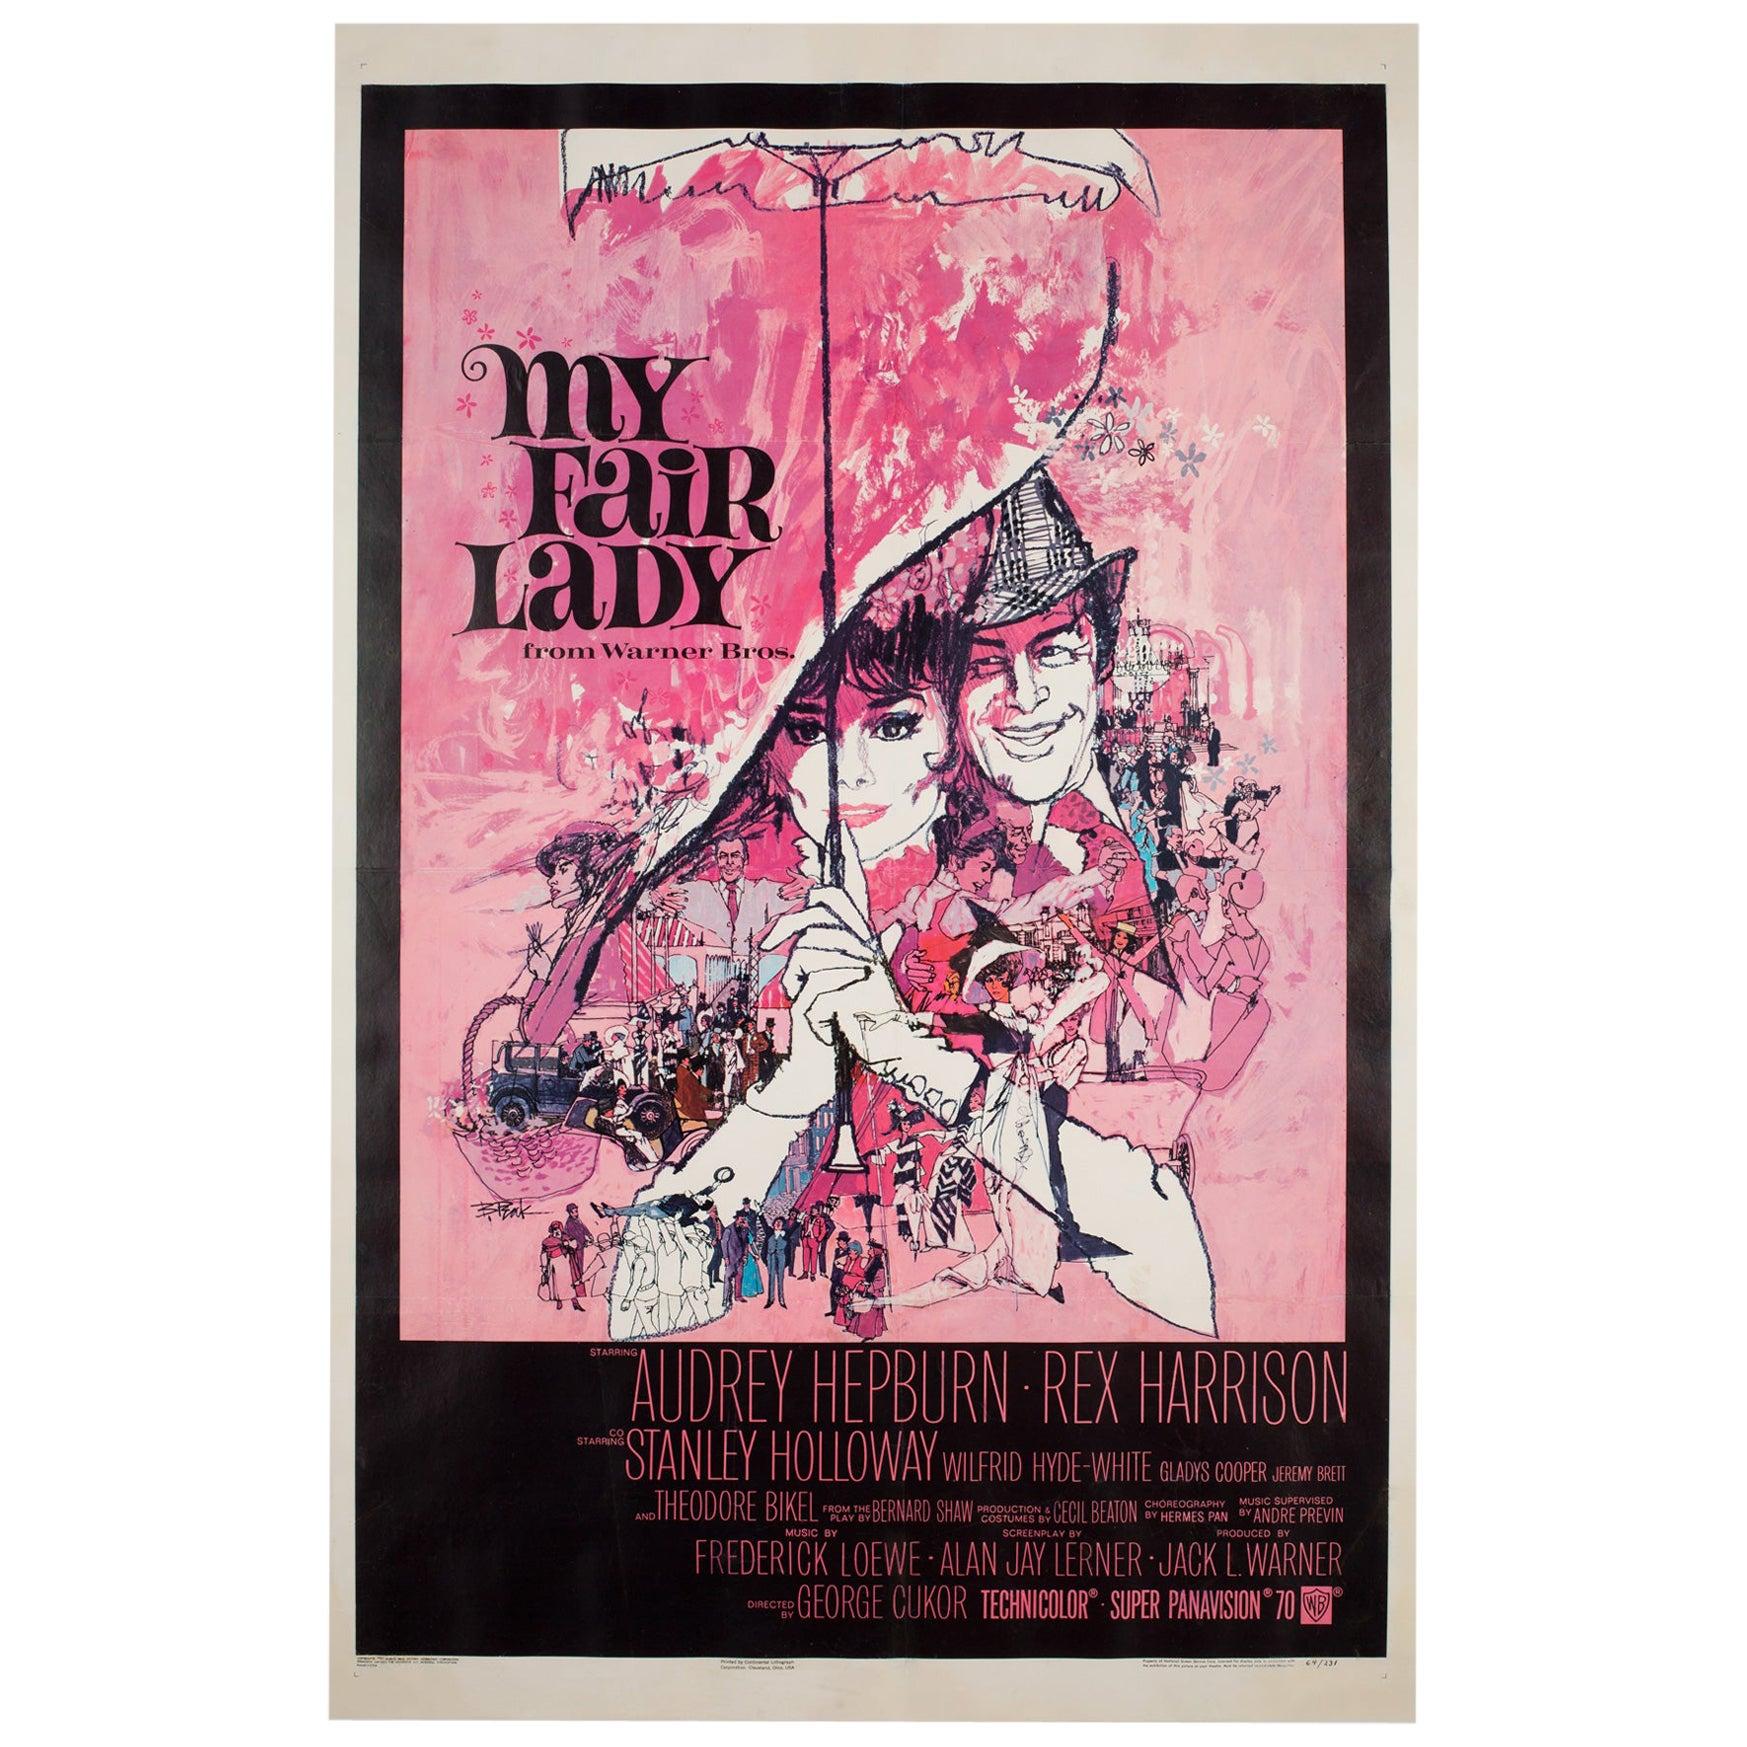 'My Fair Lady' 1964 US 1 Sheet Film Poster, Peak